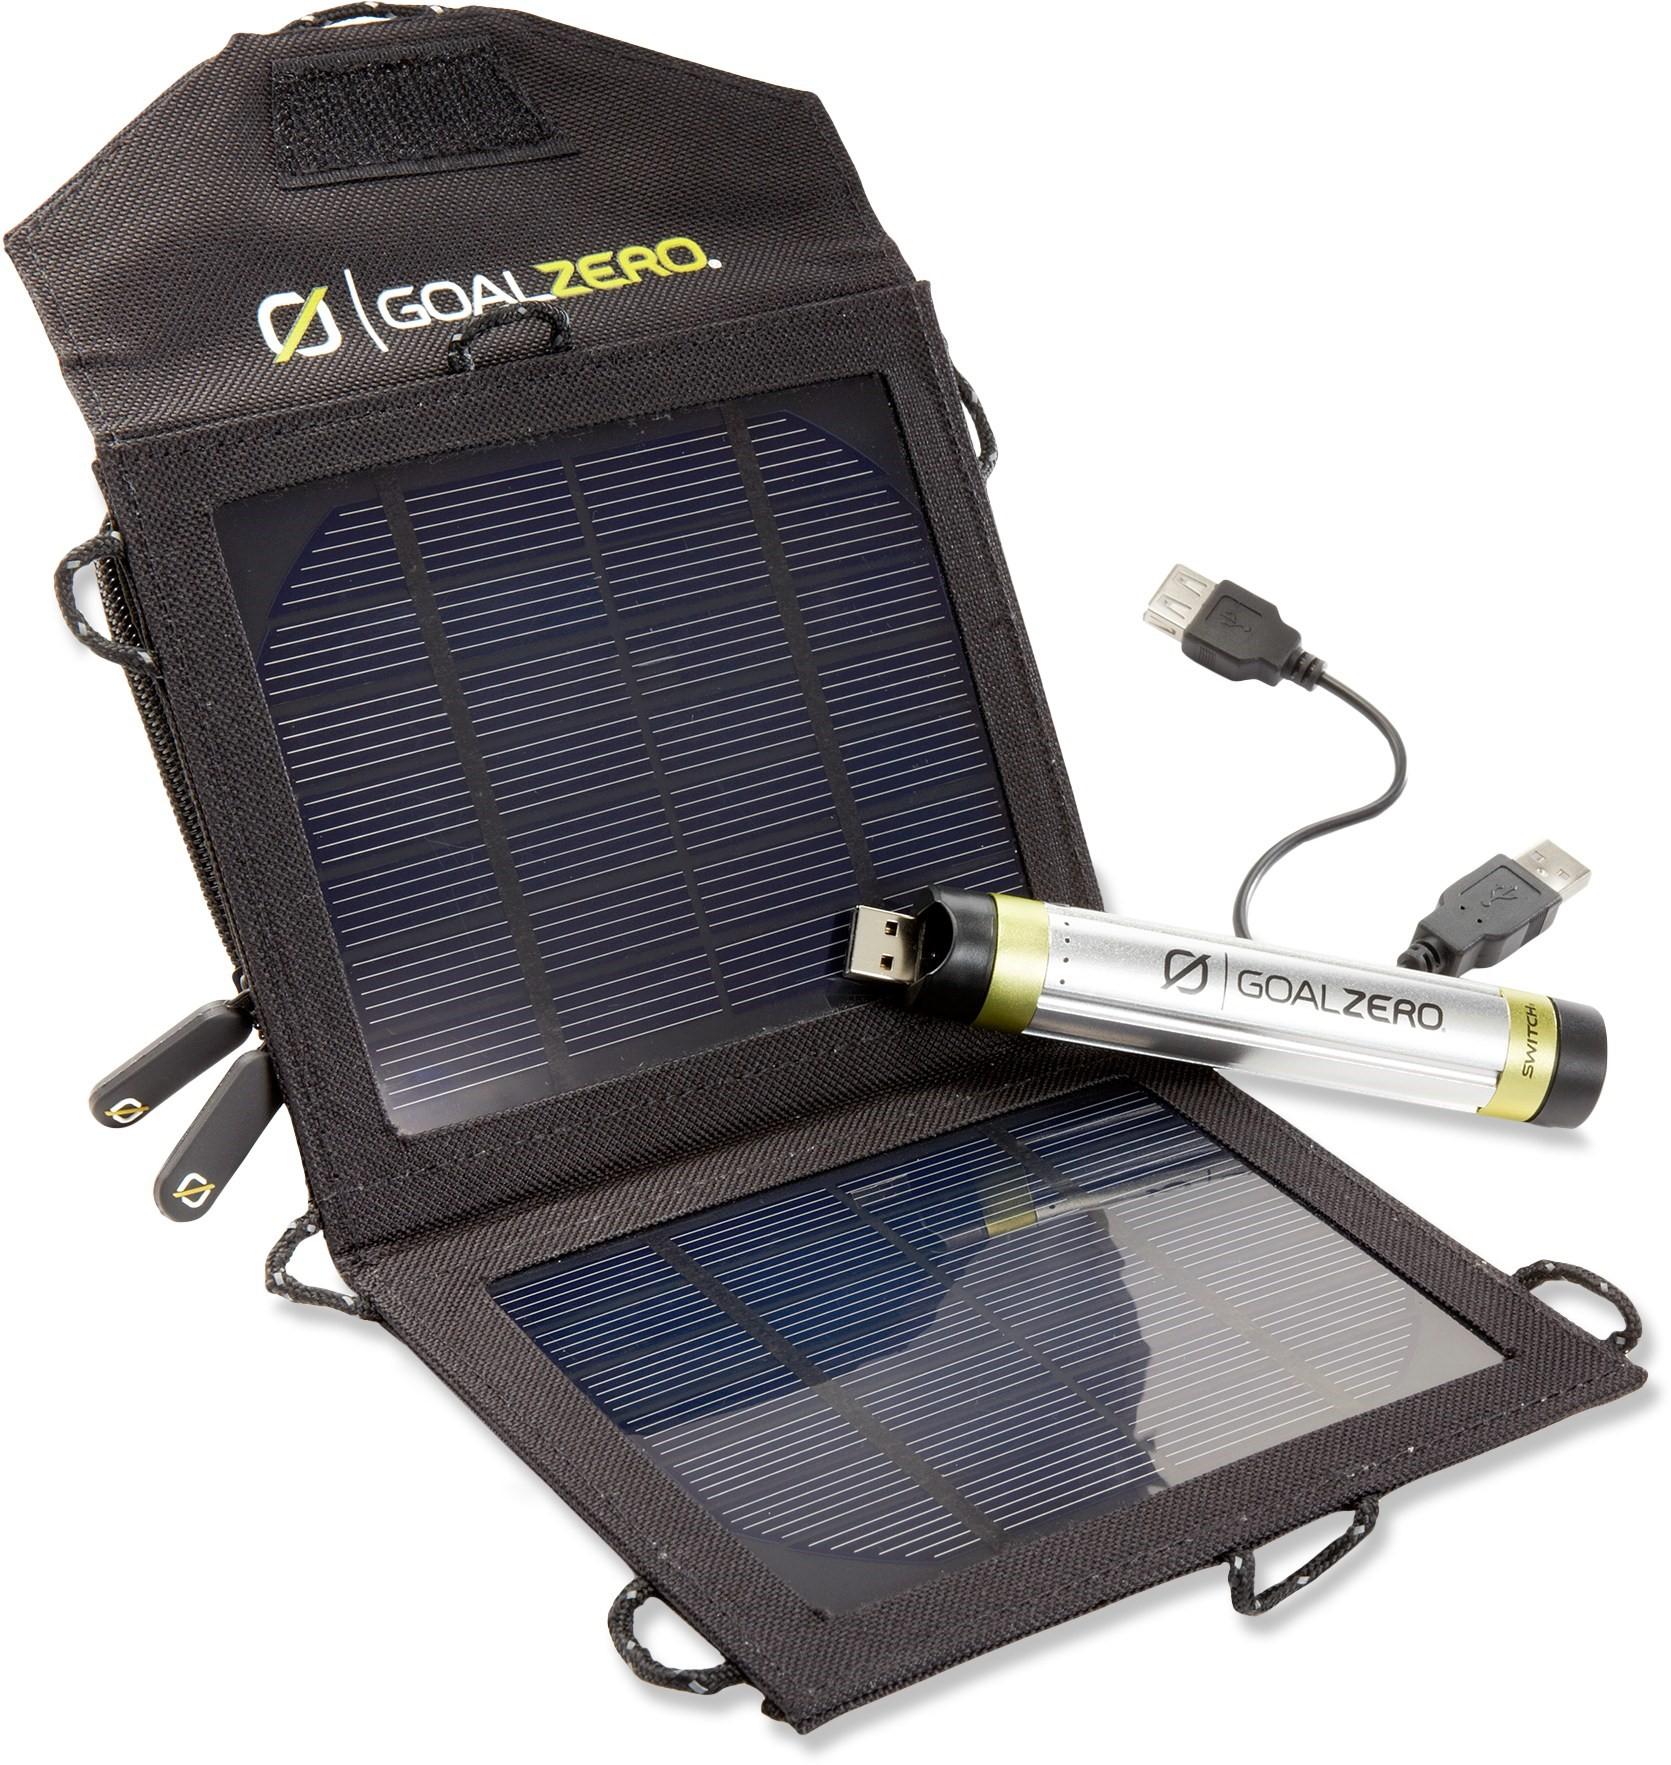 GOALZERO NOMAD 3.5 SOLAR PANEL/SWITCH 8 POWERPACK KIT REVIEW